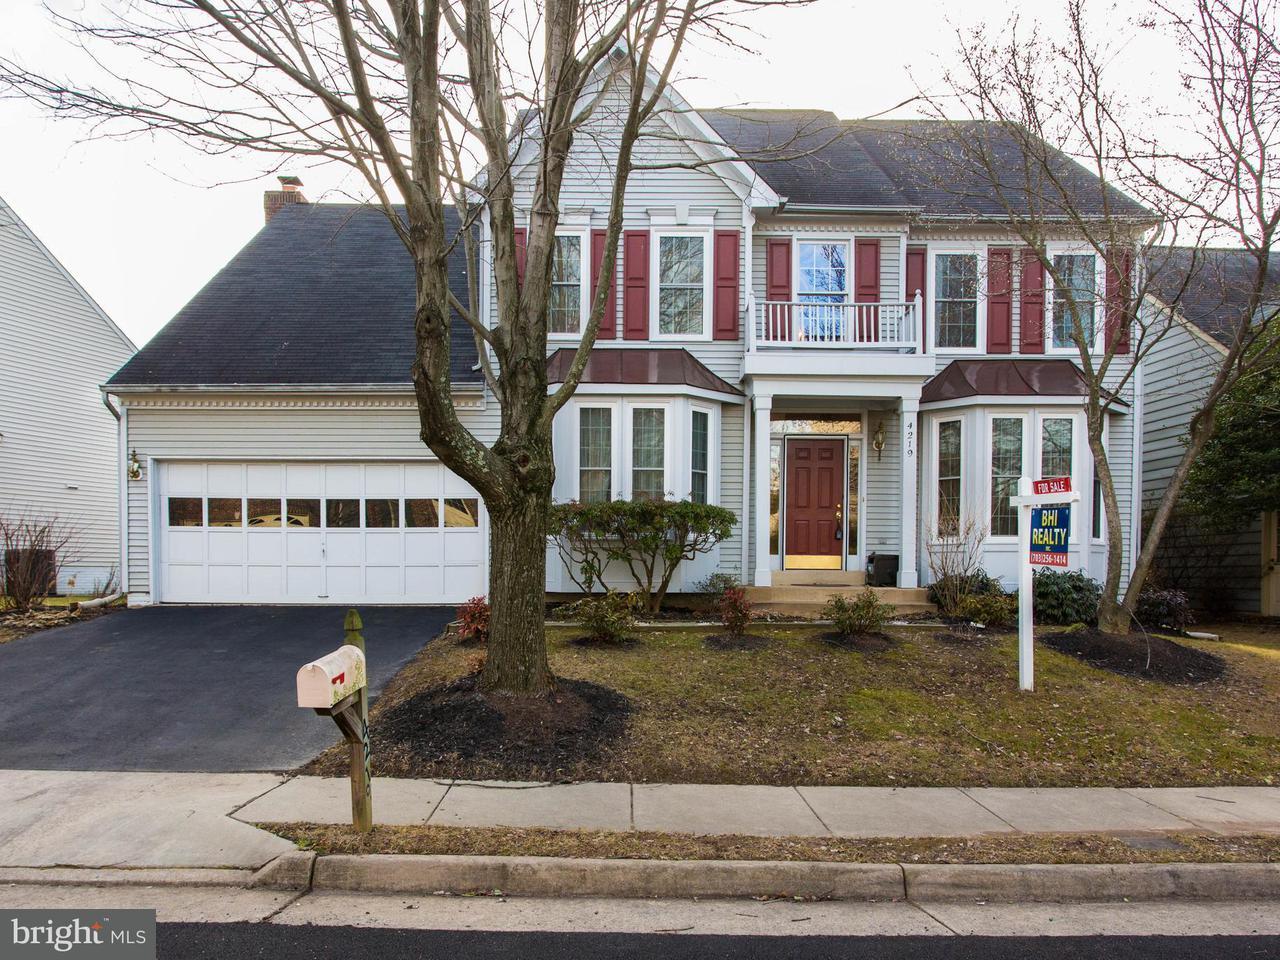 Vivienda unifamiliar por un Venta en 4219 Trowbridge Street 4219 Trowbridge Street Fairfax, Virginia 22030 Estados Unidos